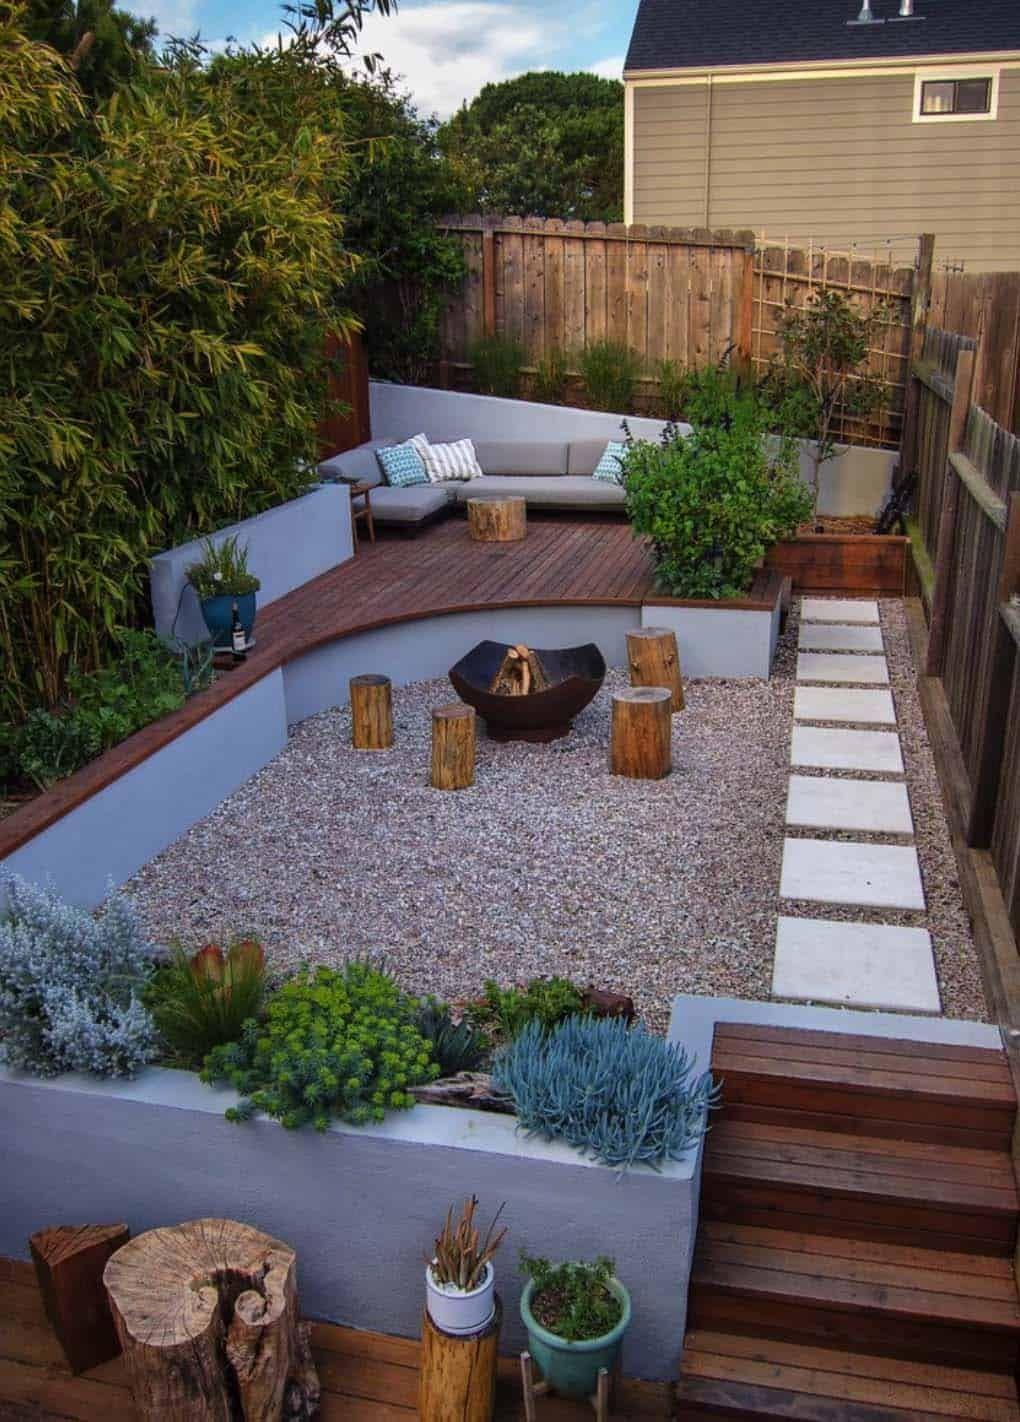 28 Inspiring Fire Pit Ideas To Create A Fabulous Backyard Oasis Small Backyard Garden Design Small Backyard Gardens Small Backyard Design